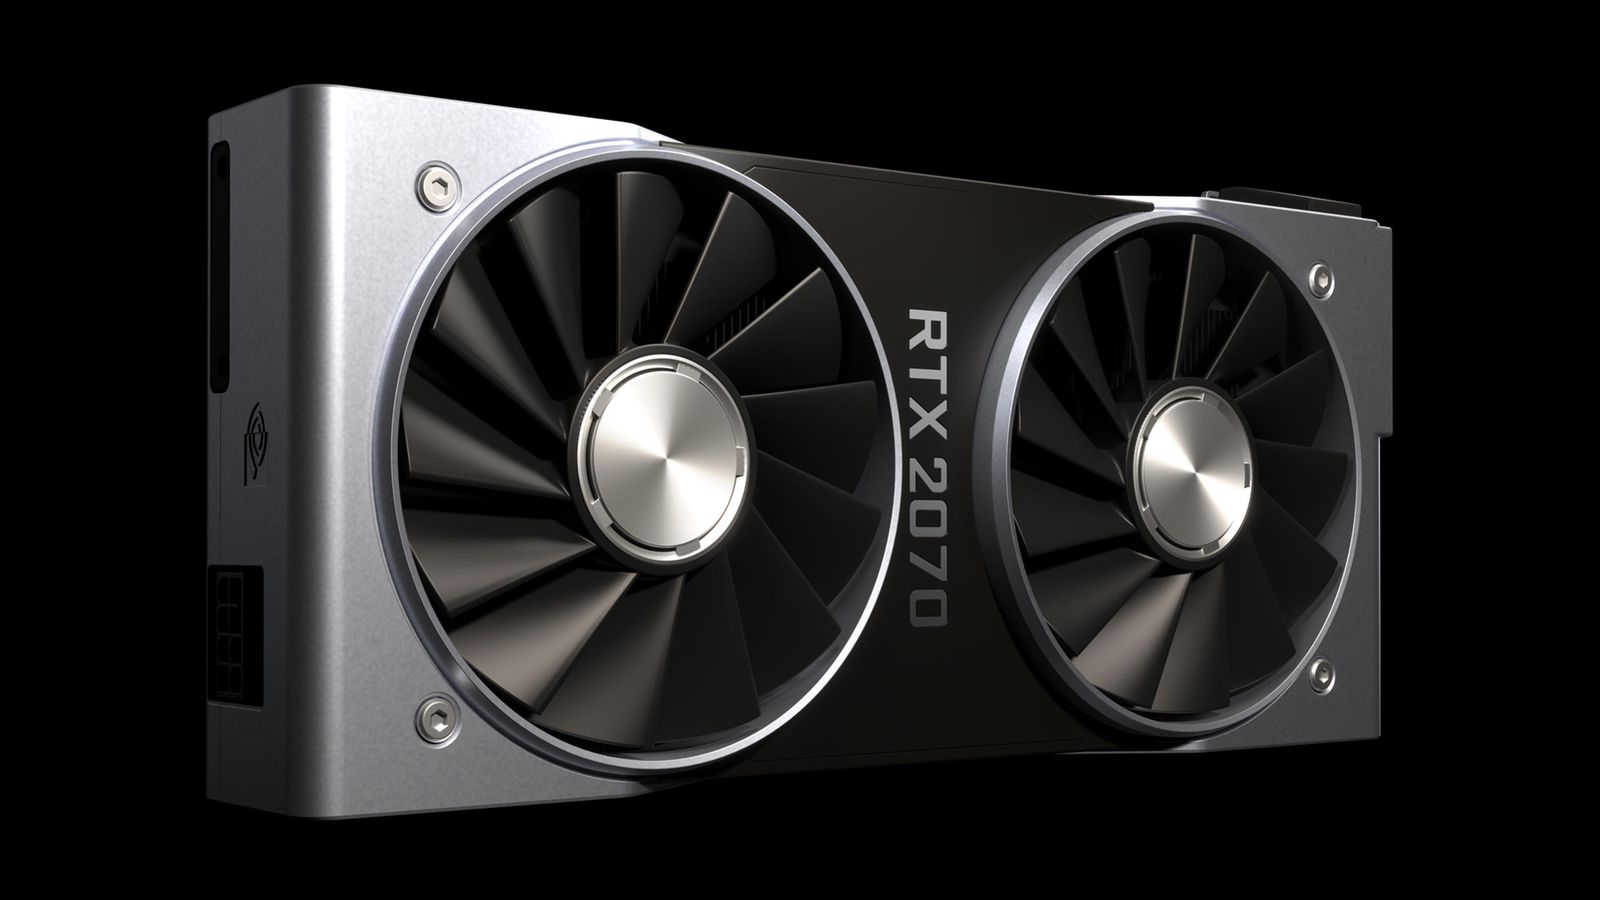 Новое поколение видеокарт от Nvidia